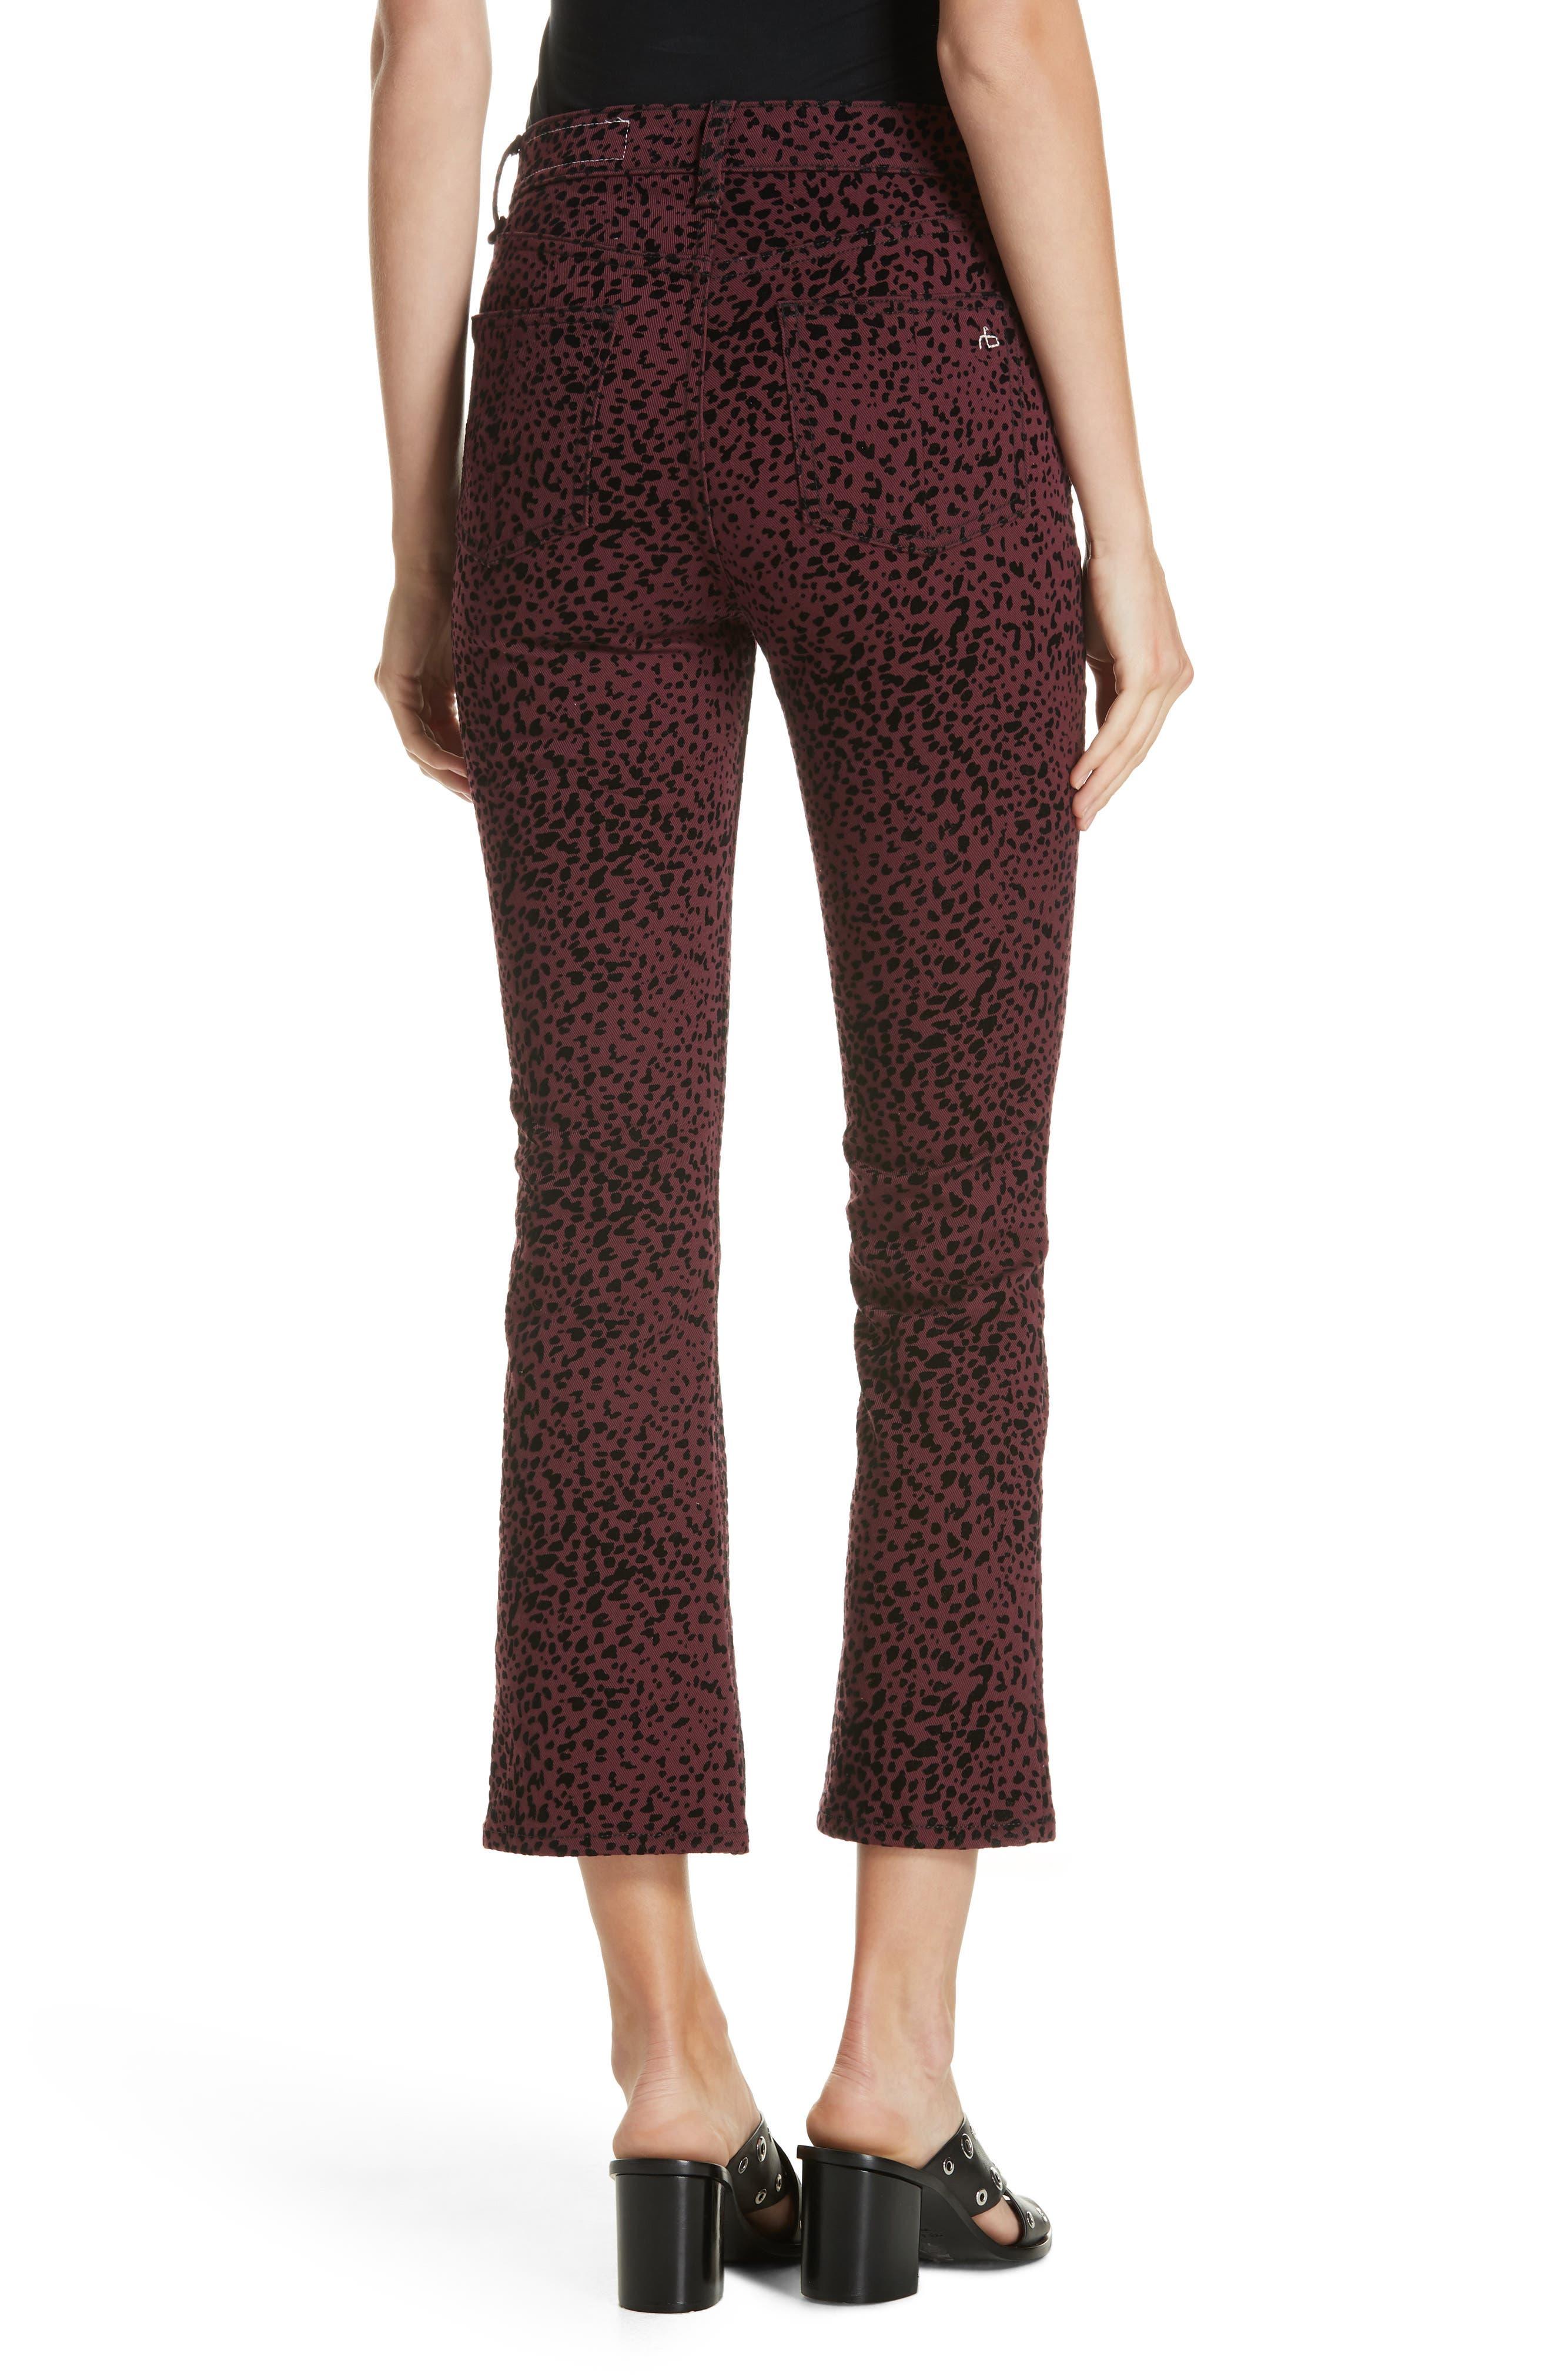 Hana High Waist Crop Flare Jeans,                             Alternate thumbnail 2, color,                             930